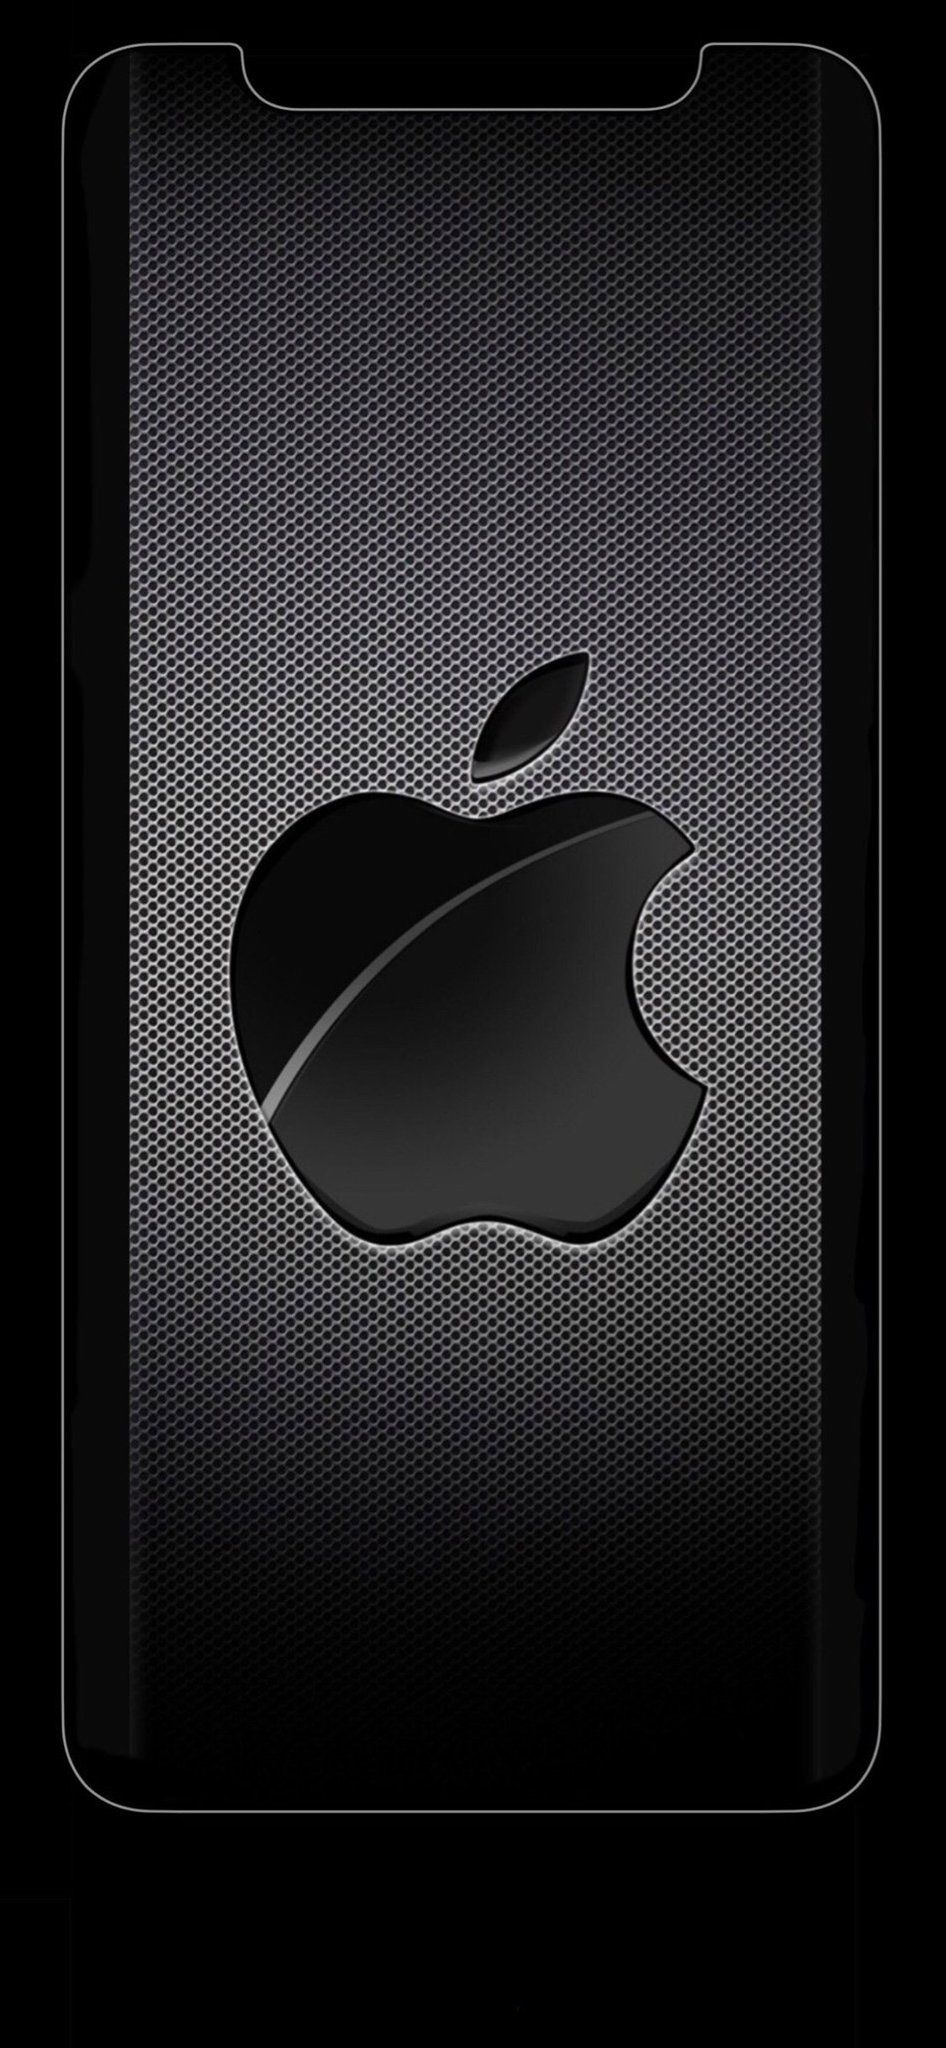 Iphonex Ios11 Ios12 Lockscreen Homescreen Backgrounds Apple Iphone Ipad Ios Wallpaper Iphonex Iphonexs Iphonexr Ios12 Moja Duvar Kagitlari Duvar